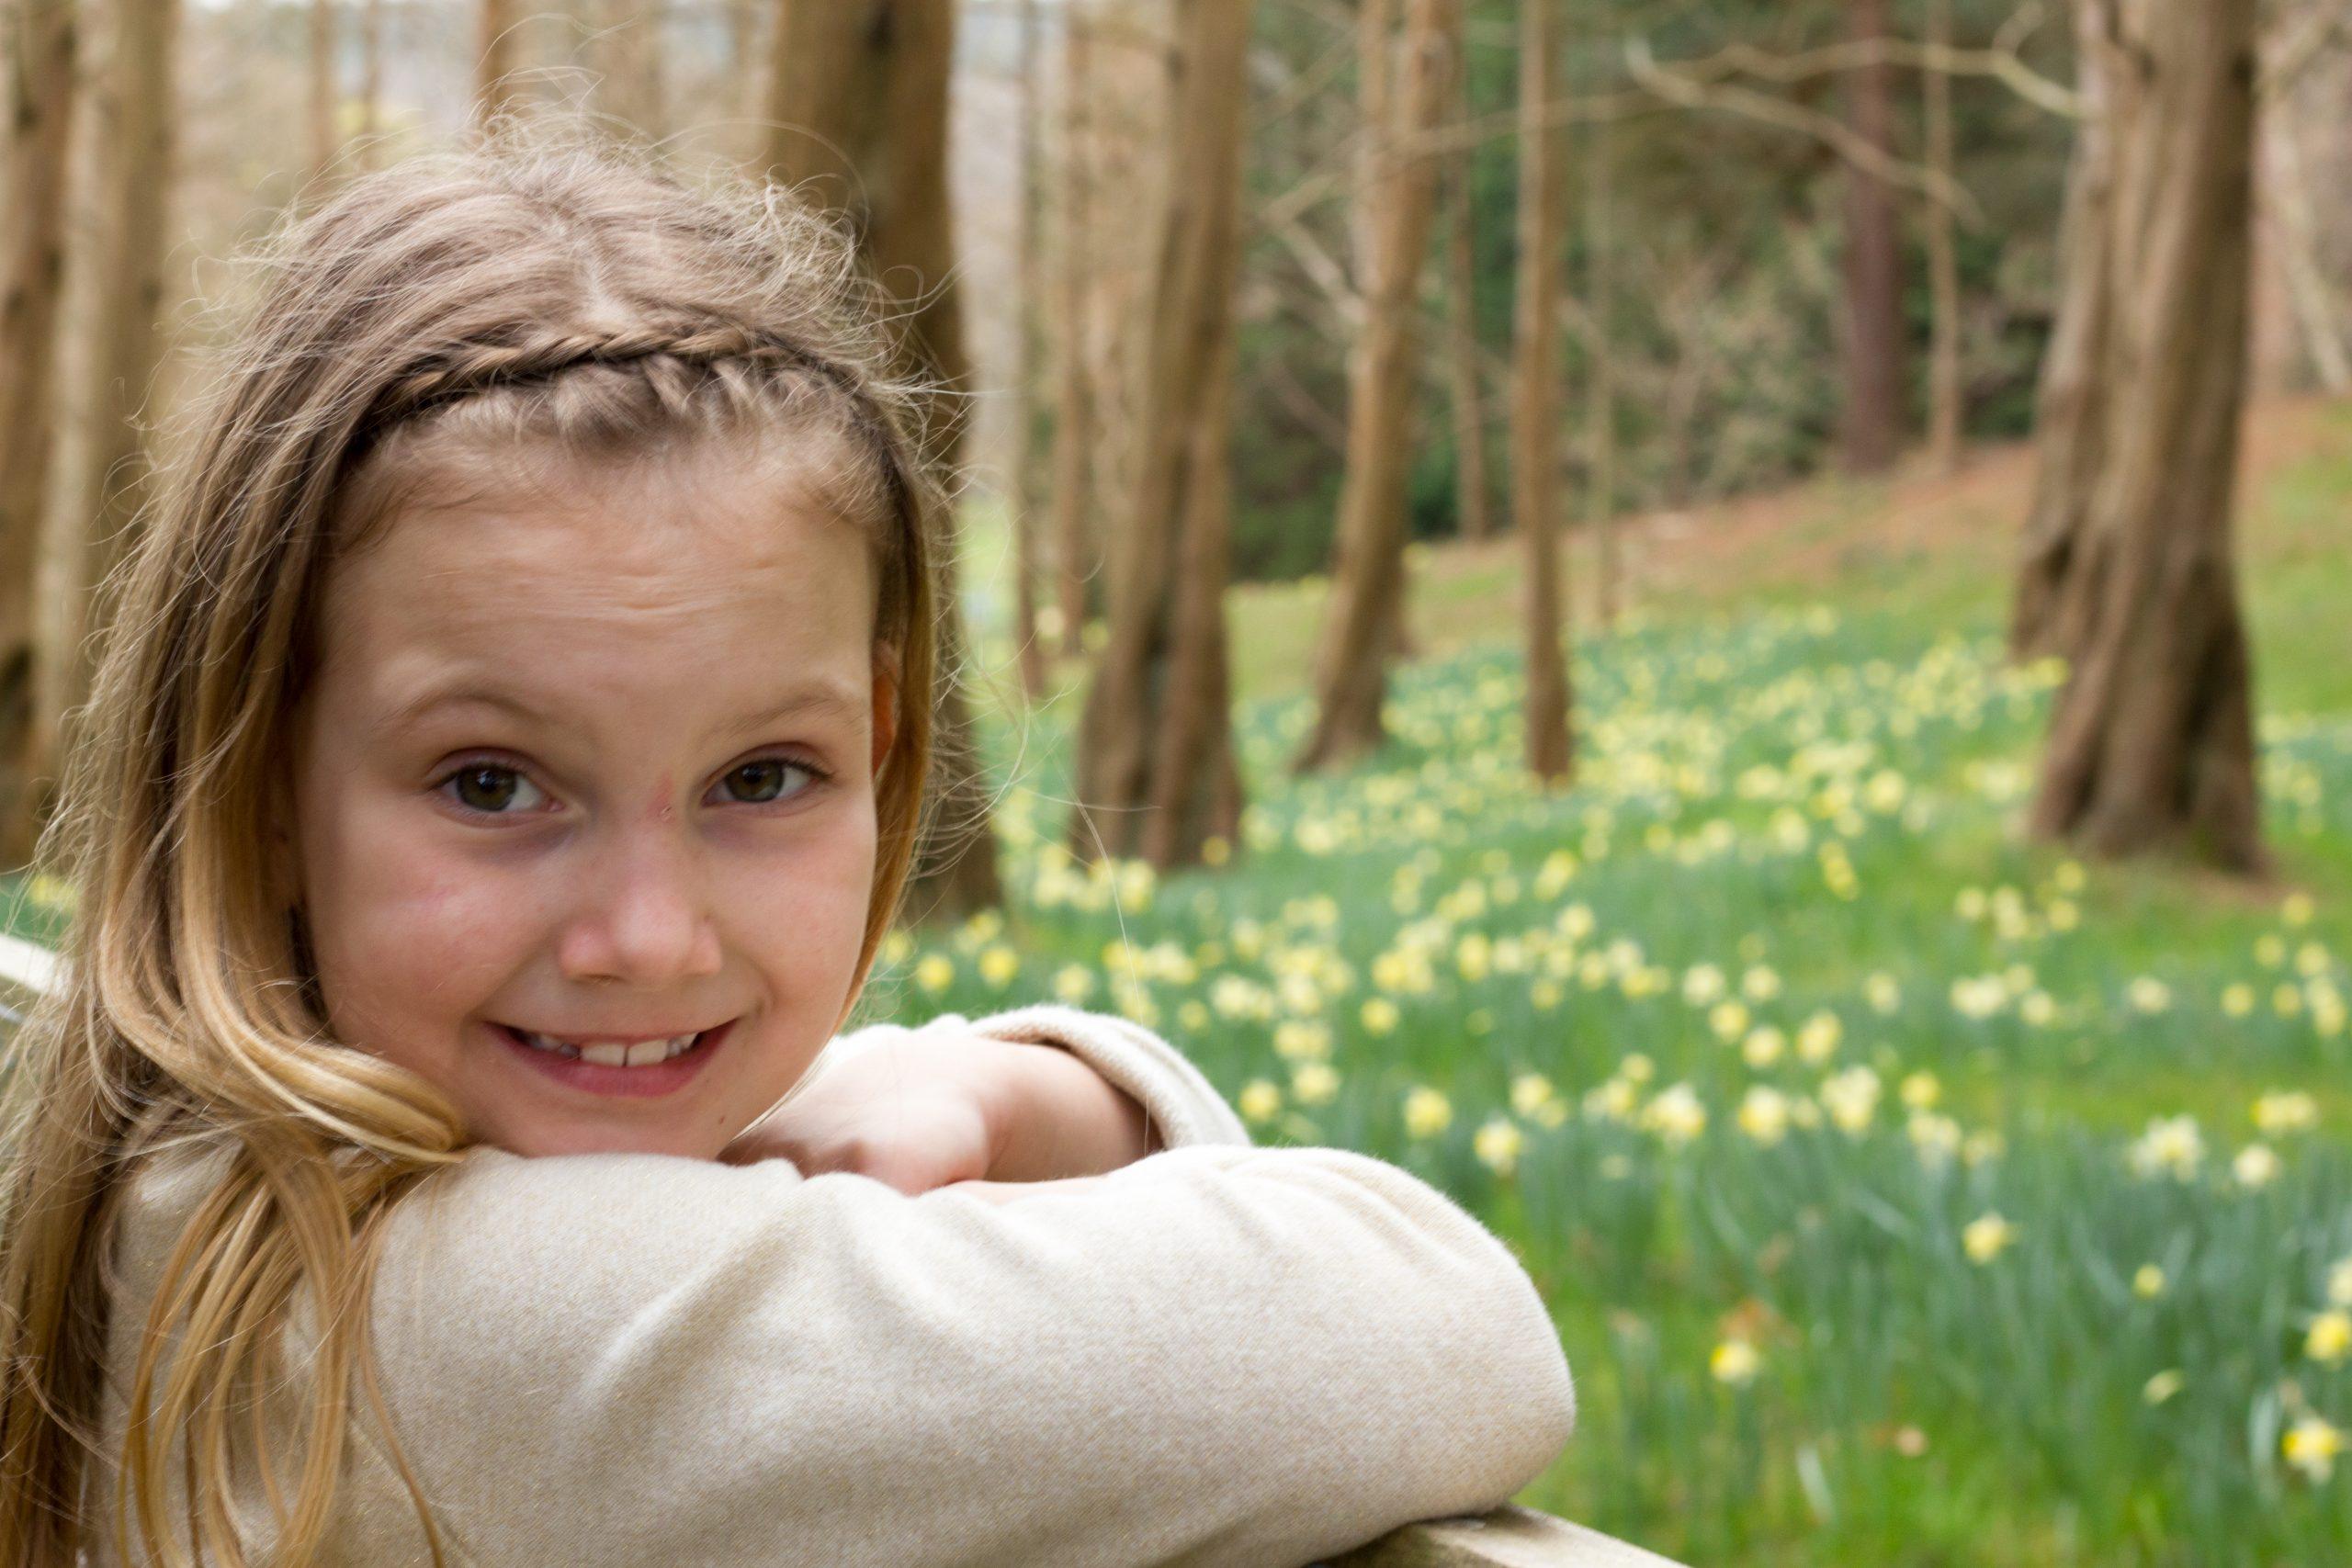 Girl looking at daffodils